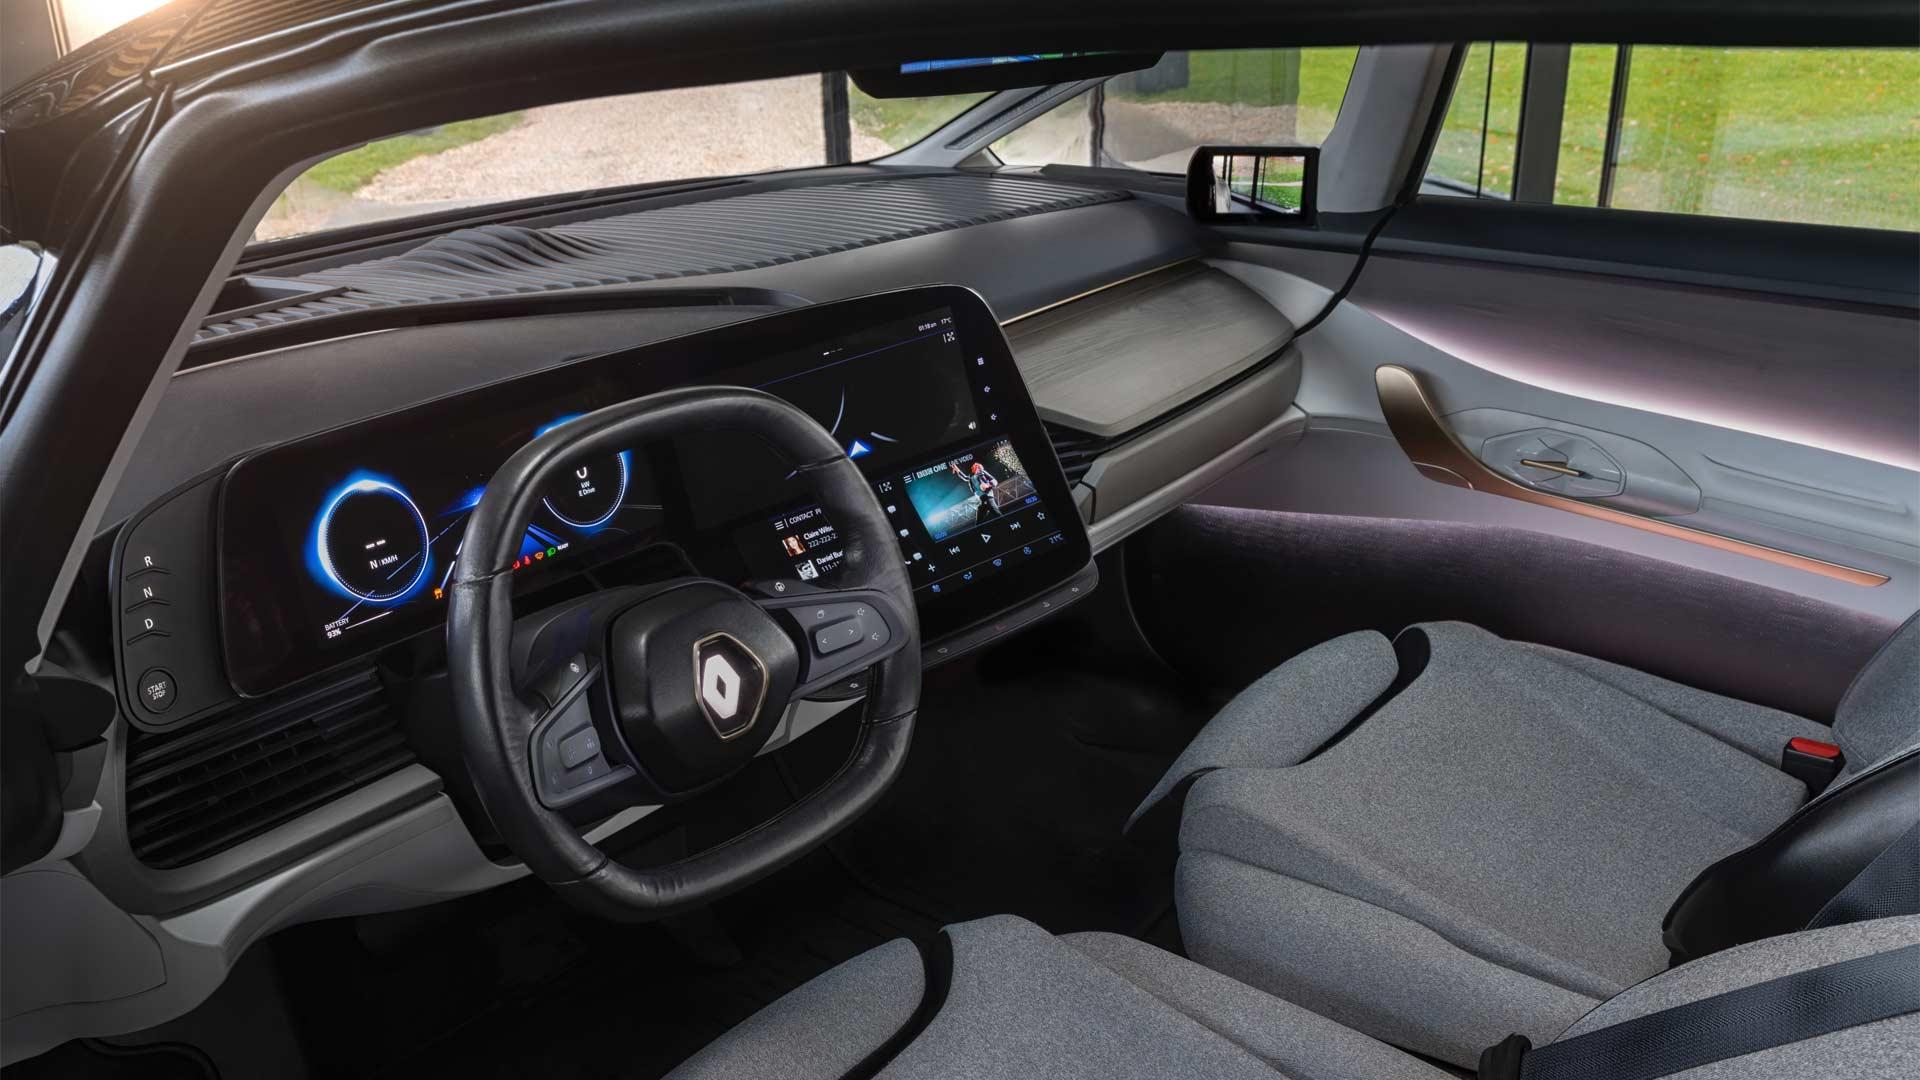 Renault-SYMBIOZ-Demo-Car-interior_3